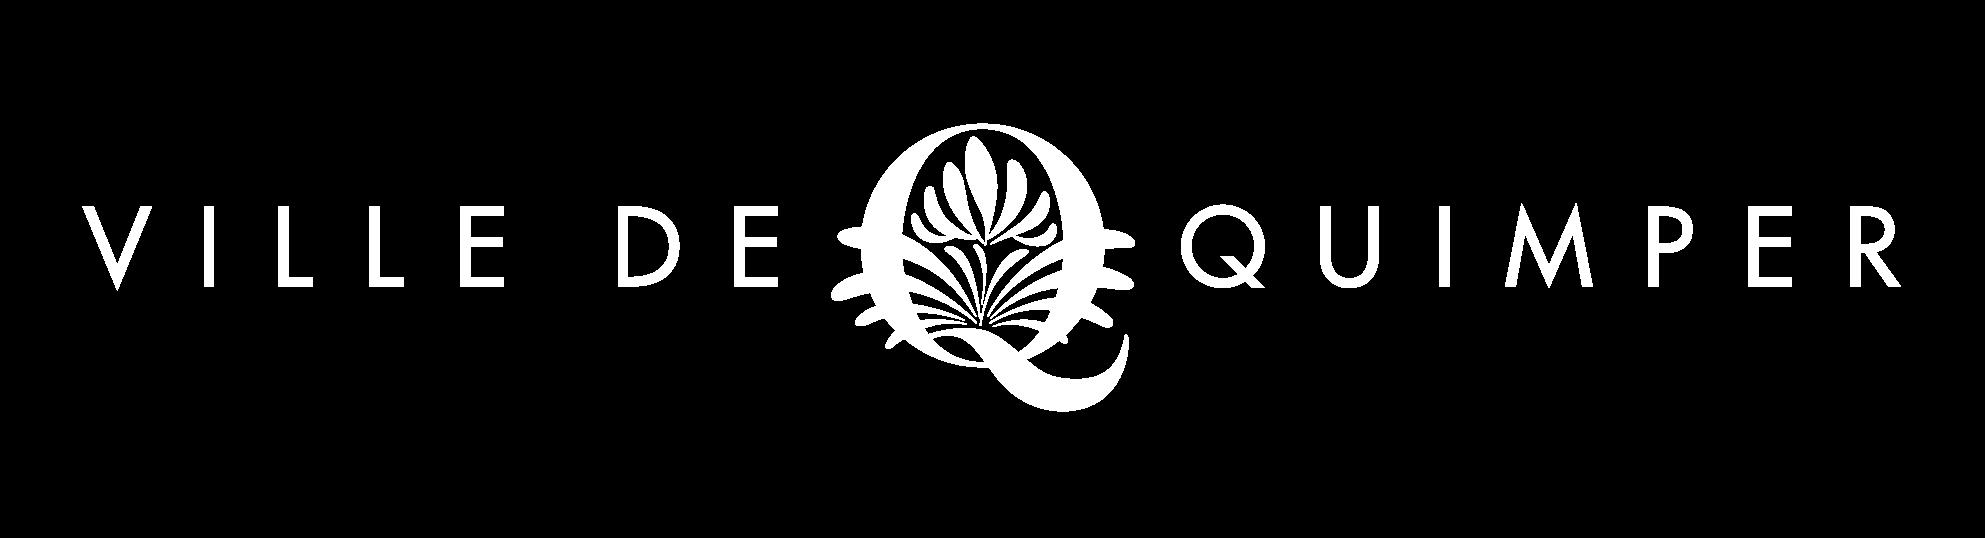 logo ville quimper